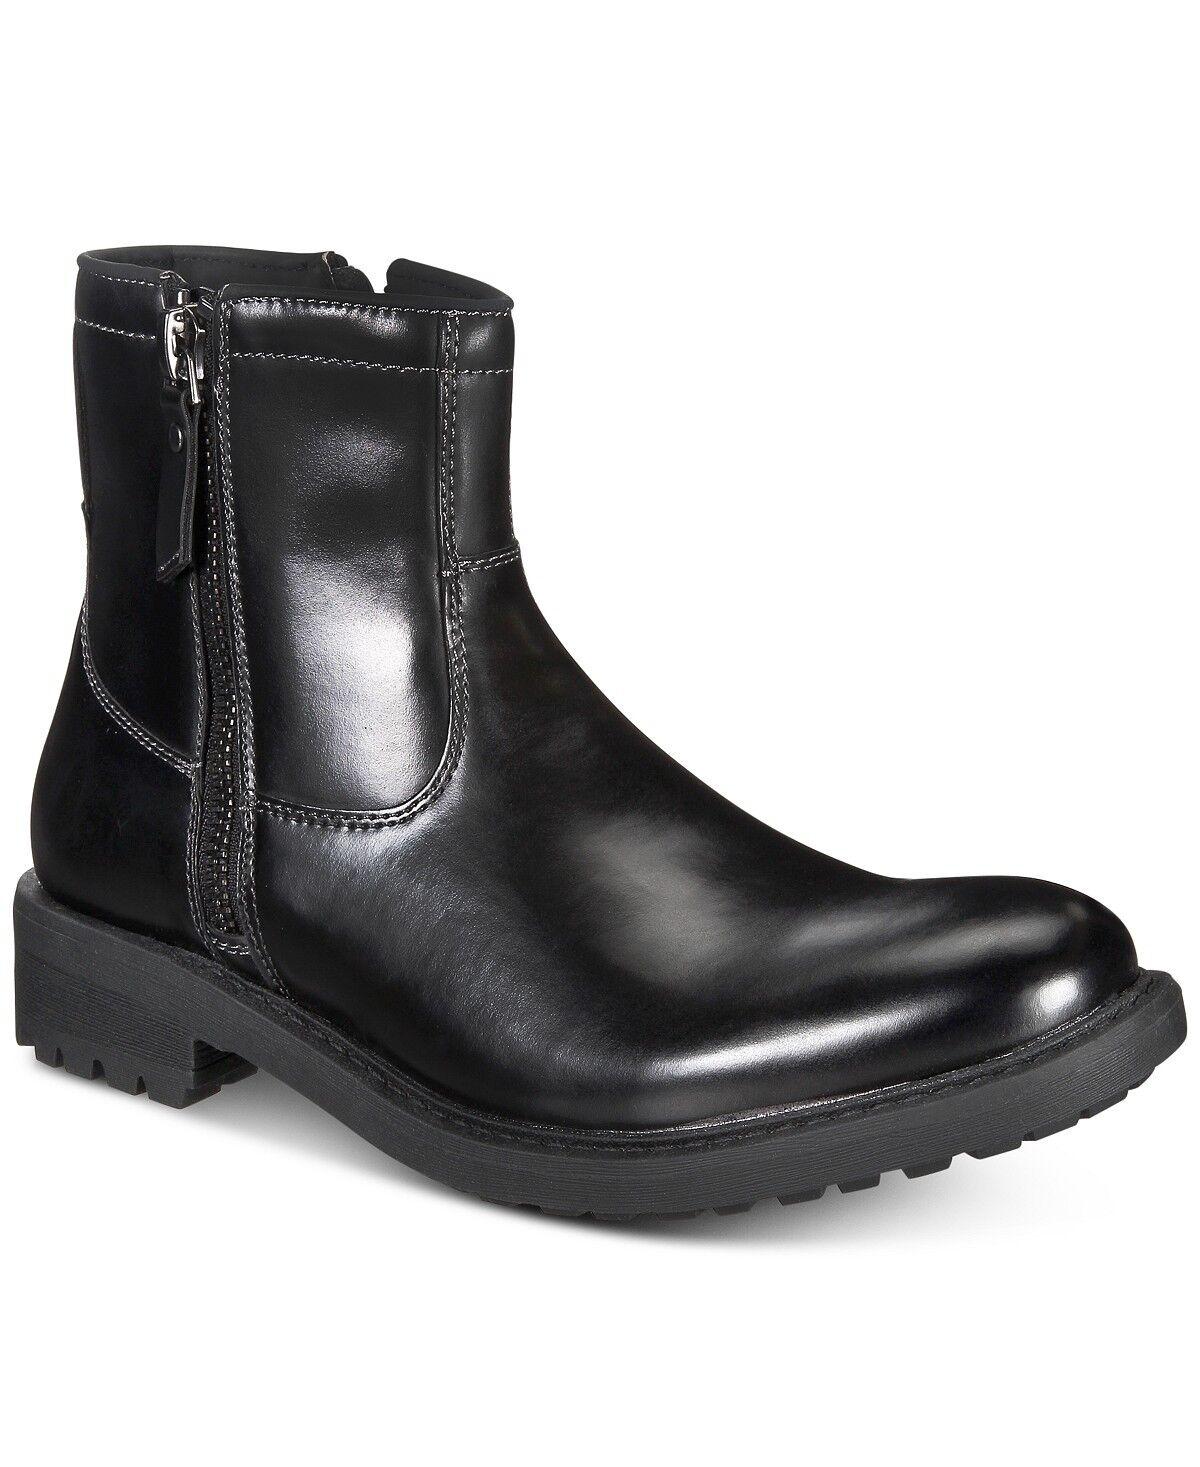 BNIB Kenneth Cole Reaction Unlisted Men's C-Roam Zip-Up Boot SZ 11 DS